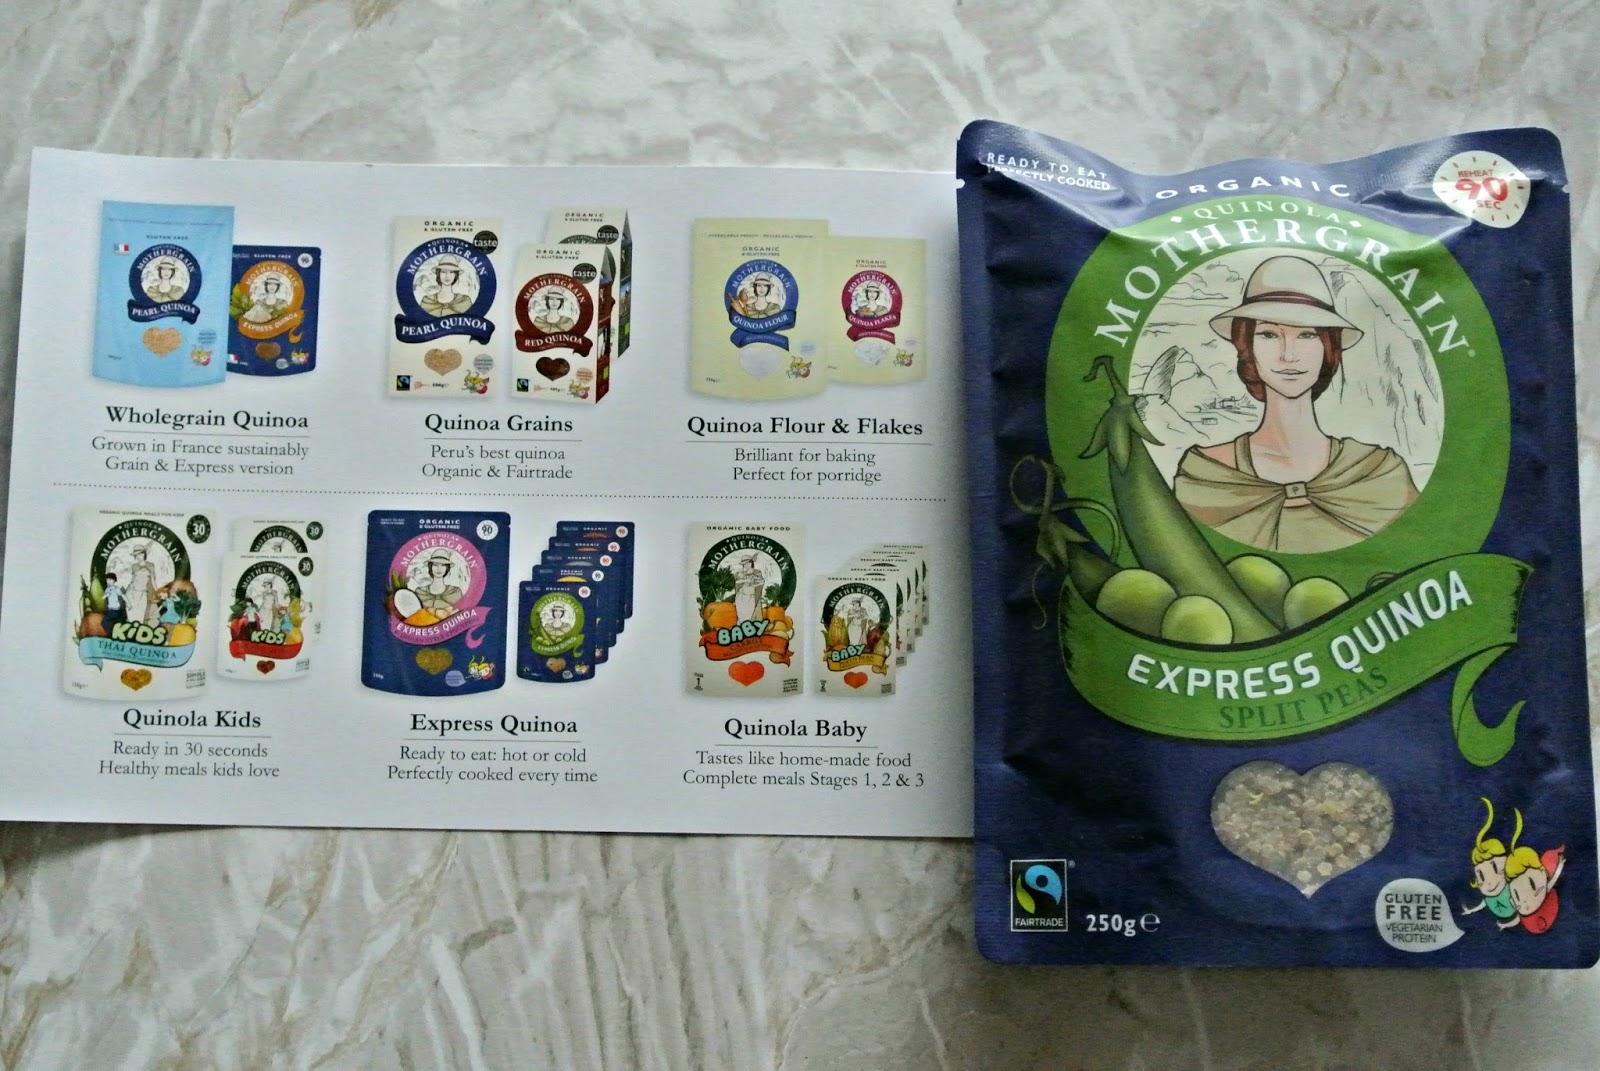 Quinola Mothergrain express quinoa with split peas fair trade degustabox